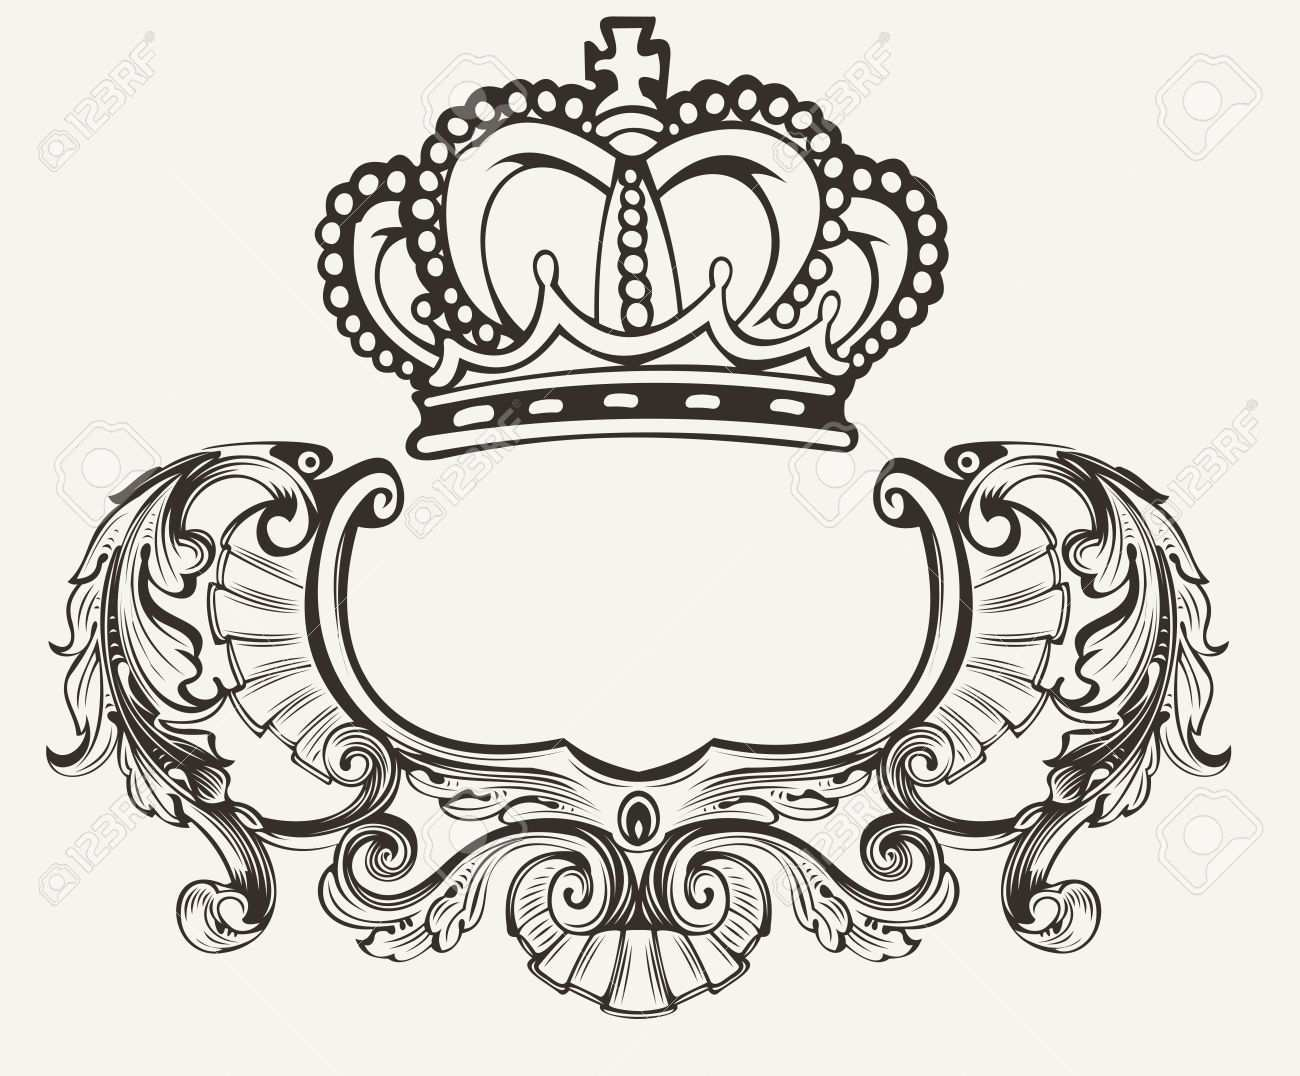 Pin Von Sawsan Chatty Auf Papan Mahkota Wappen Schablonen Muster